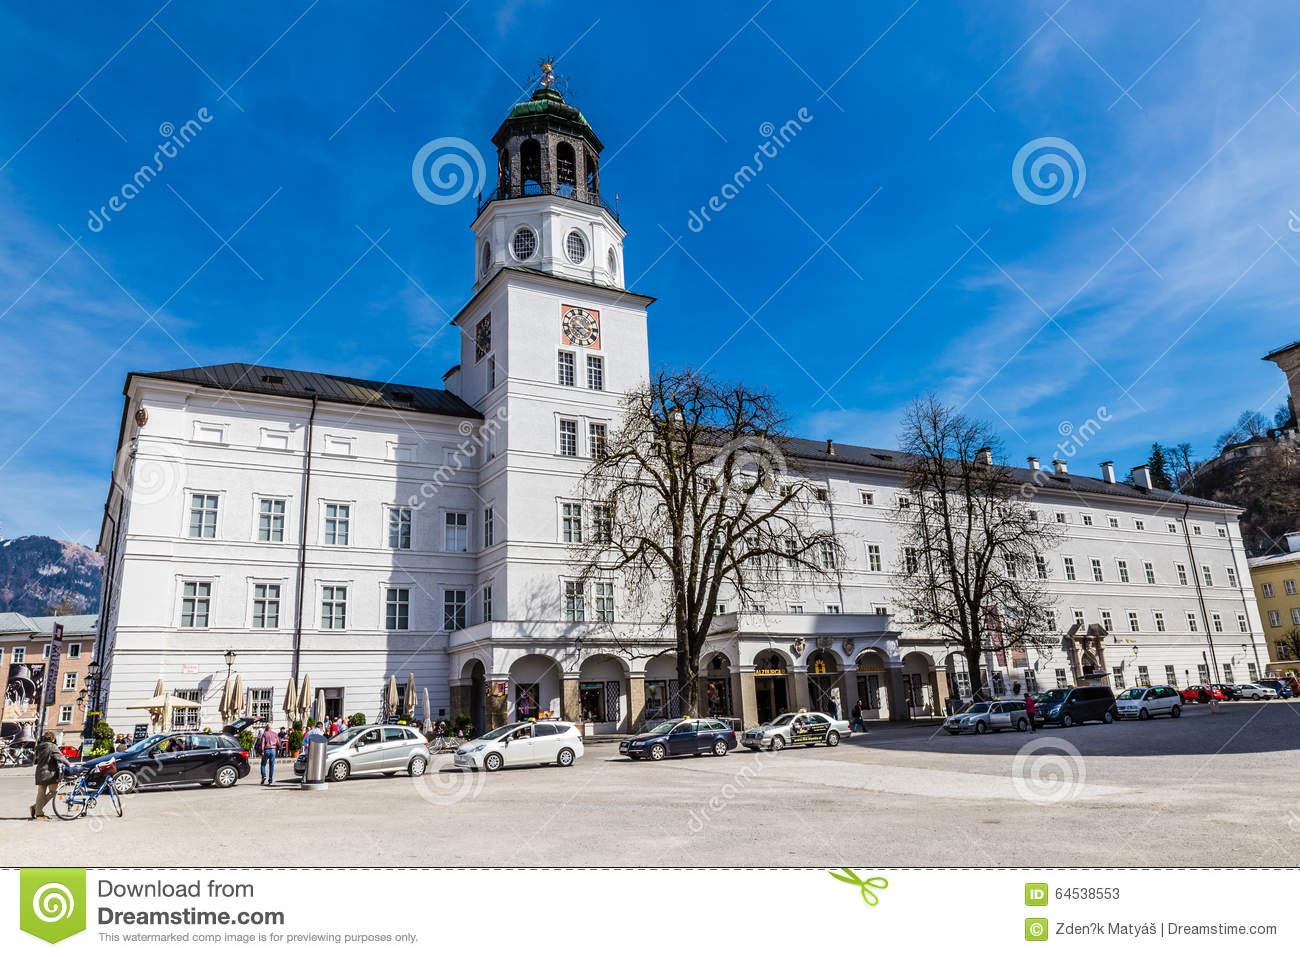 Palace And Salzburger Clock Tower.